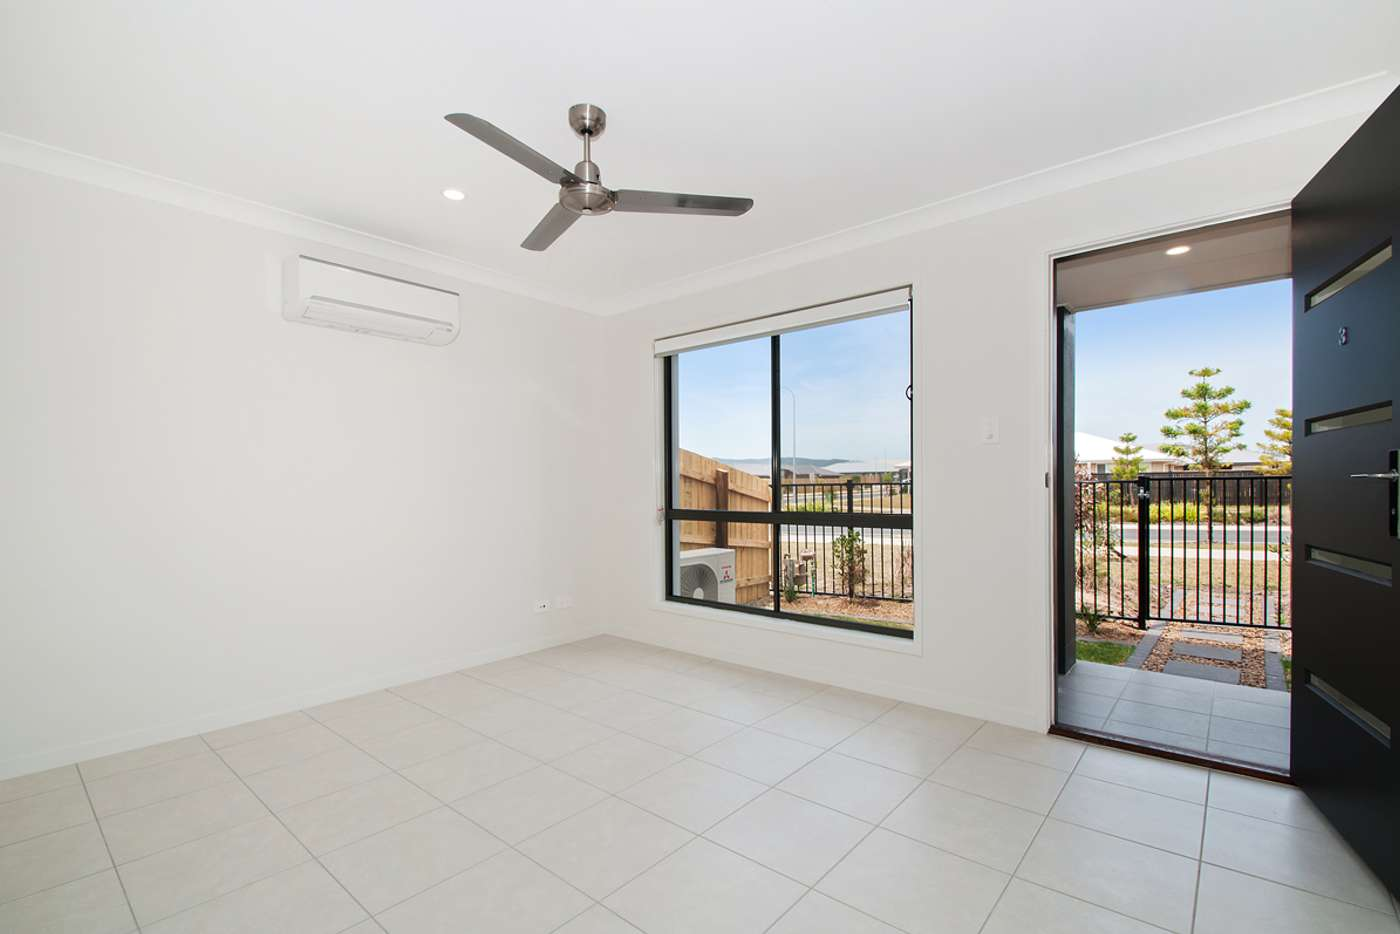 Sixth view of Homely unit listing, 3/179 Darlington Drive, Yarrabilba QLD 4207